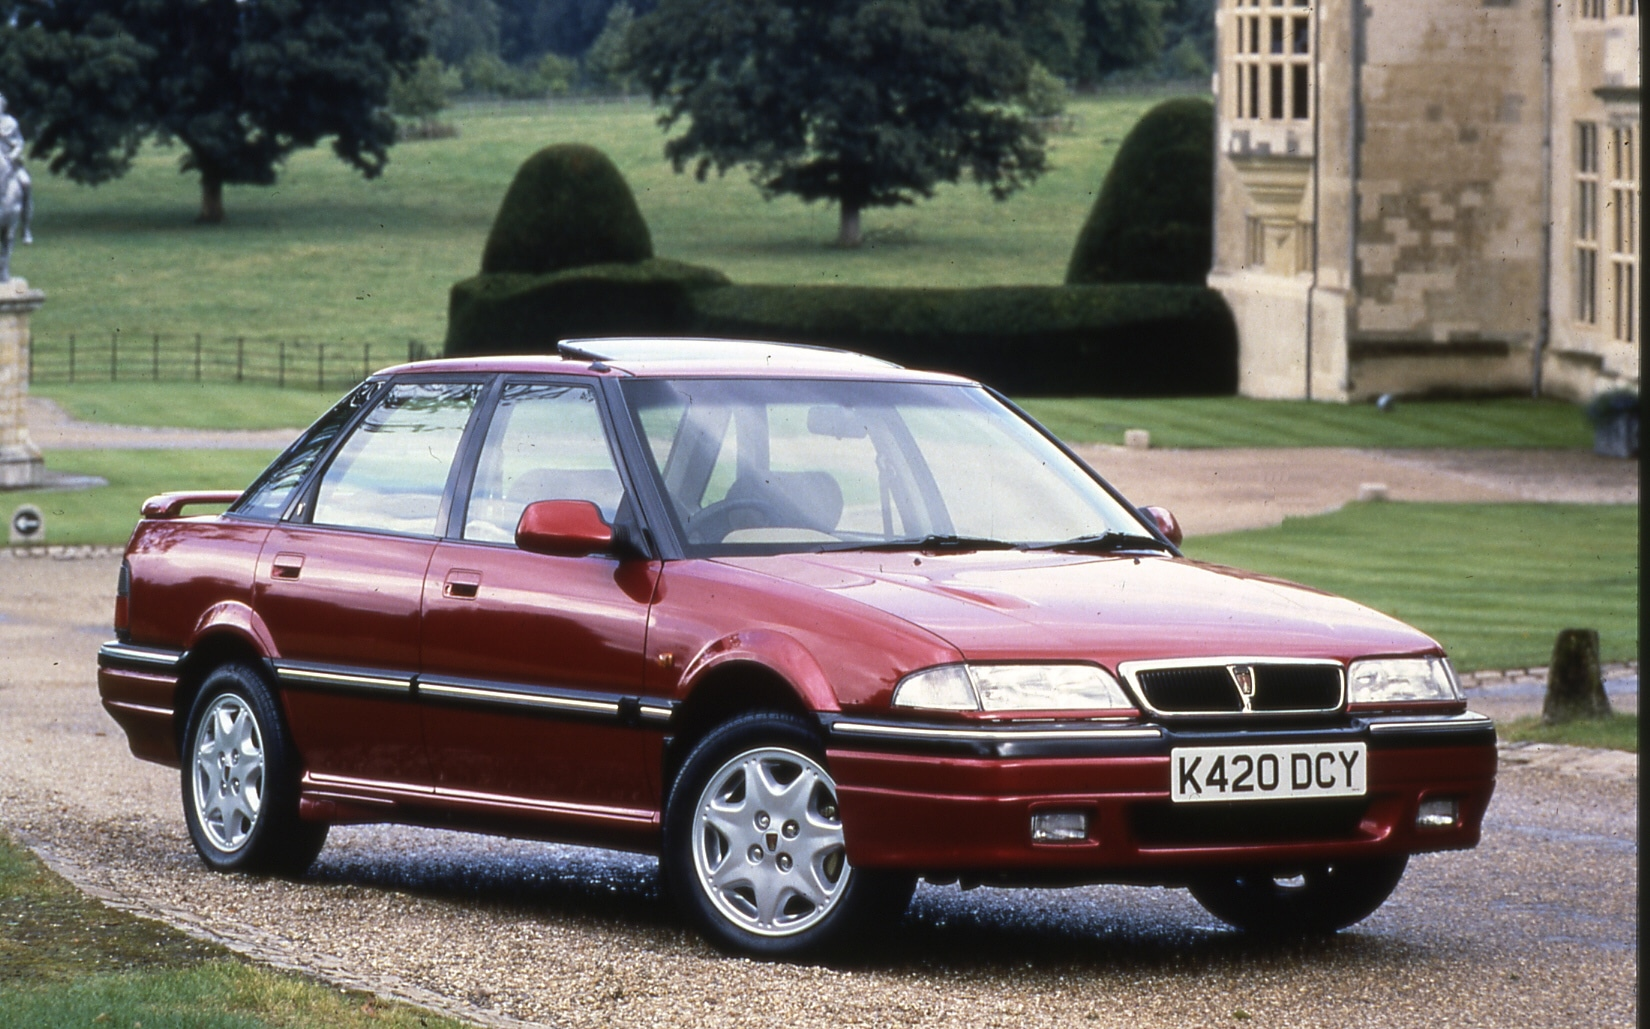 Rover, 420GSi, British, longbridge, cars, classic car, retro car, motoring, automotive